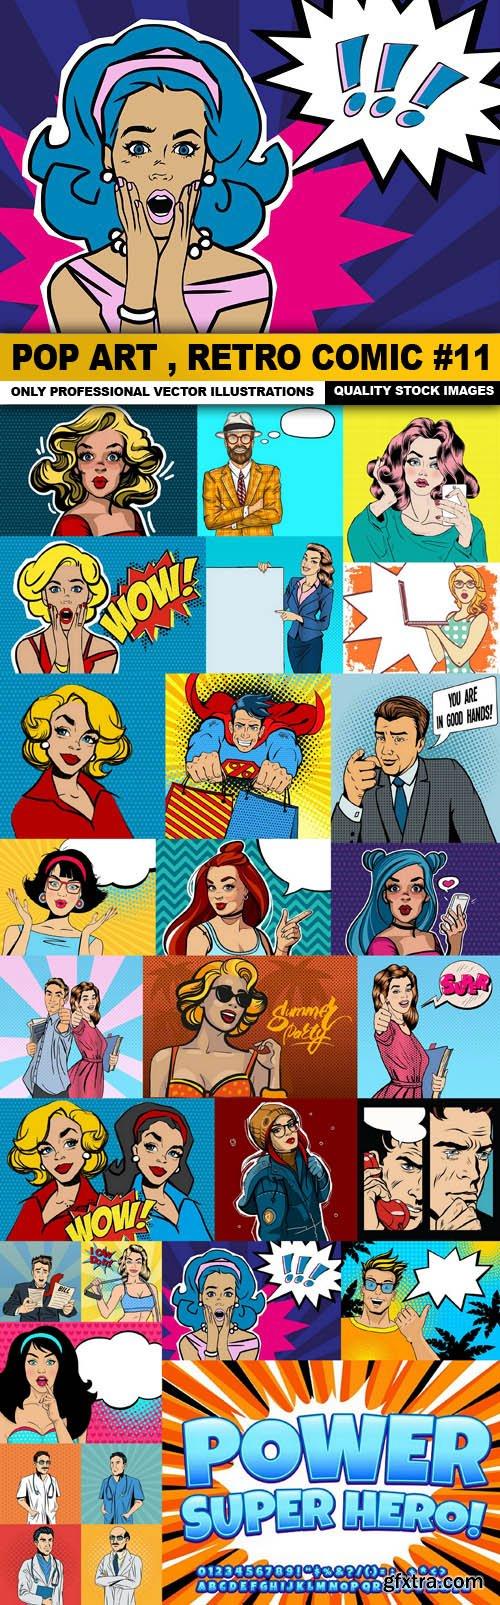 Pop Art , Retro Comic #11 - 25 Vector